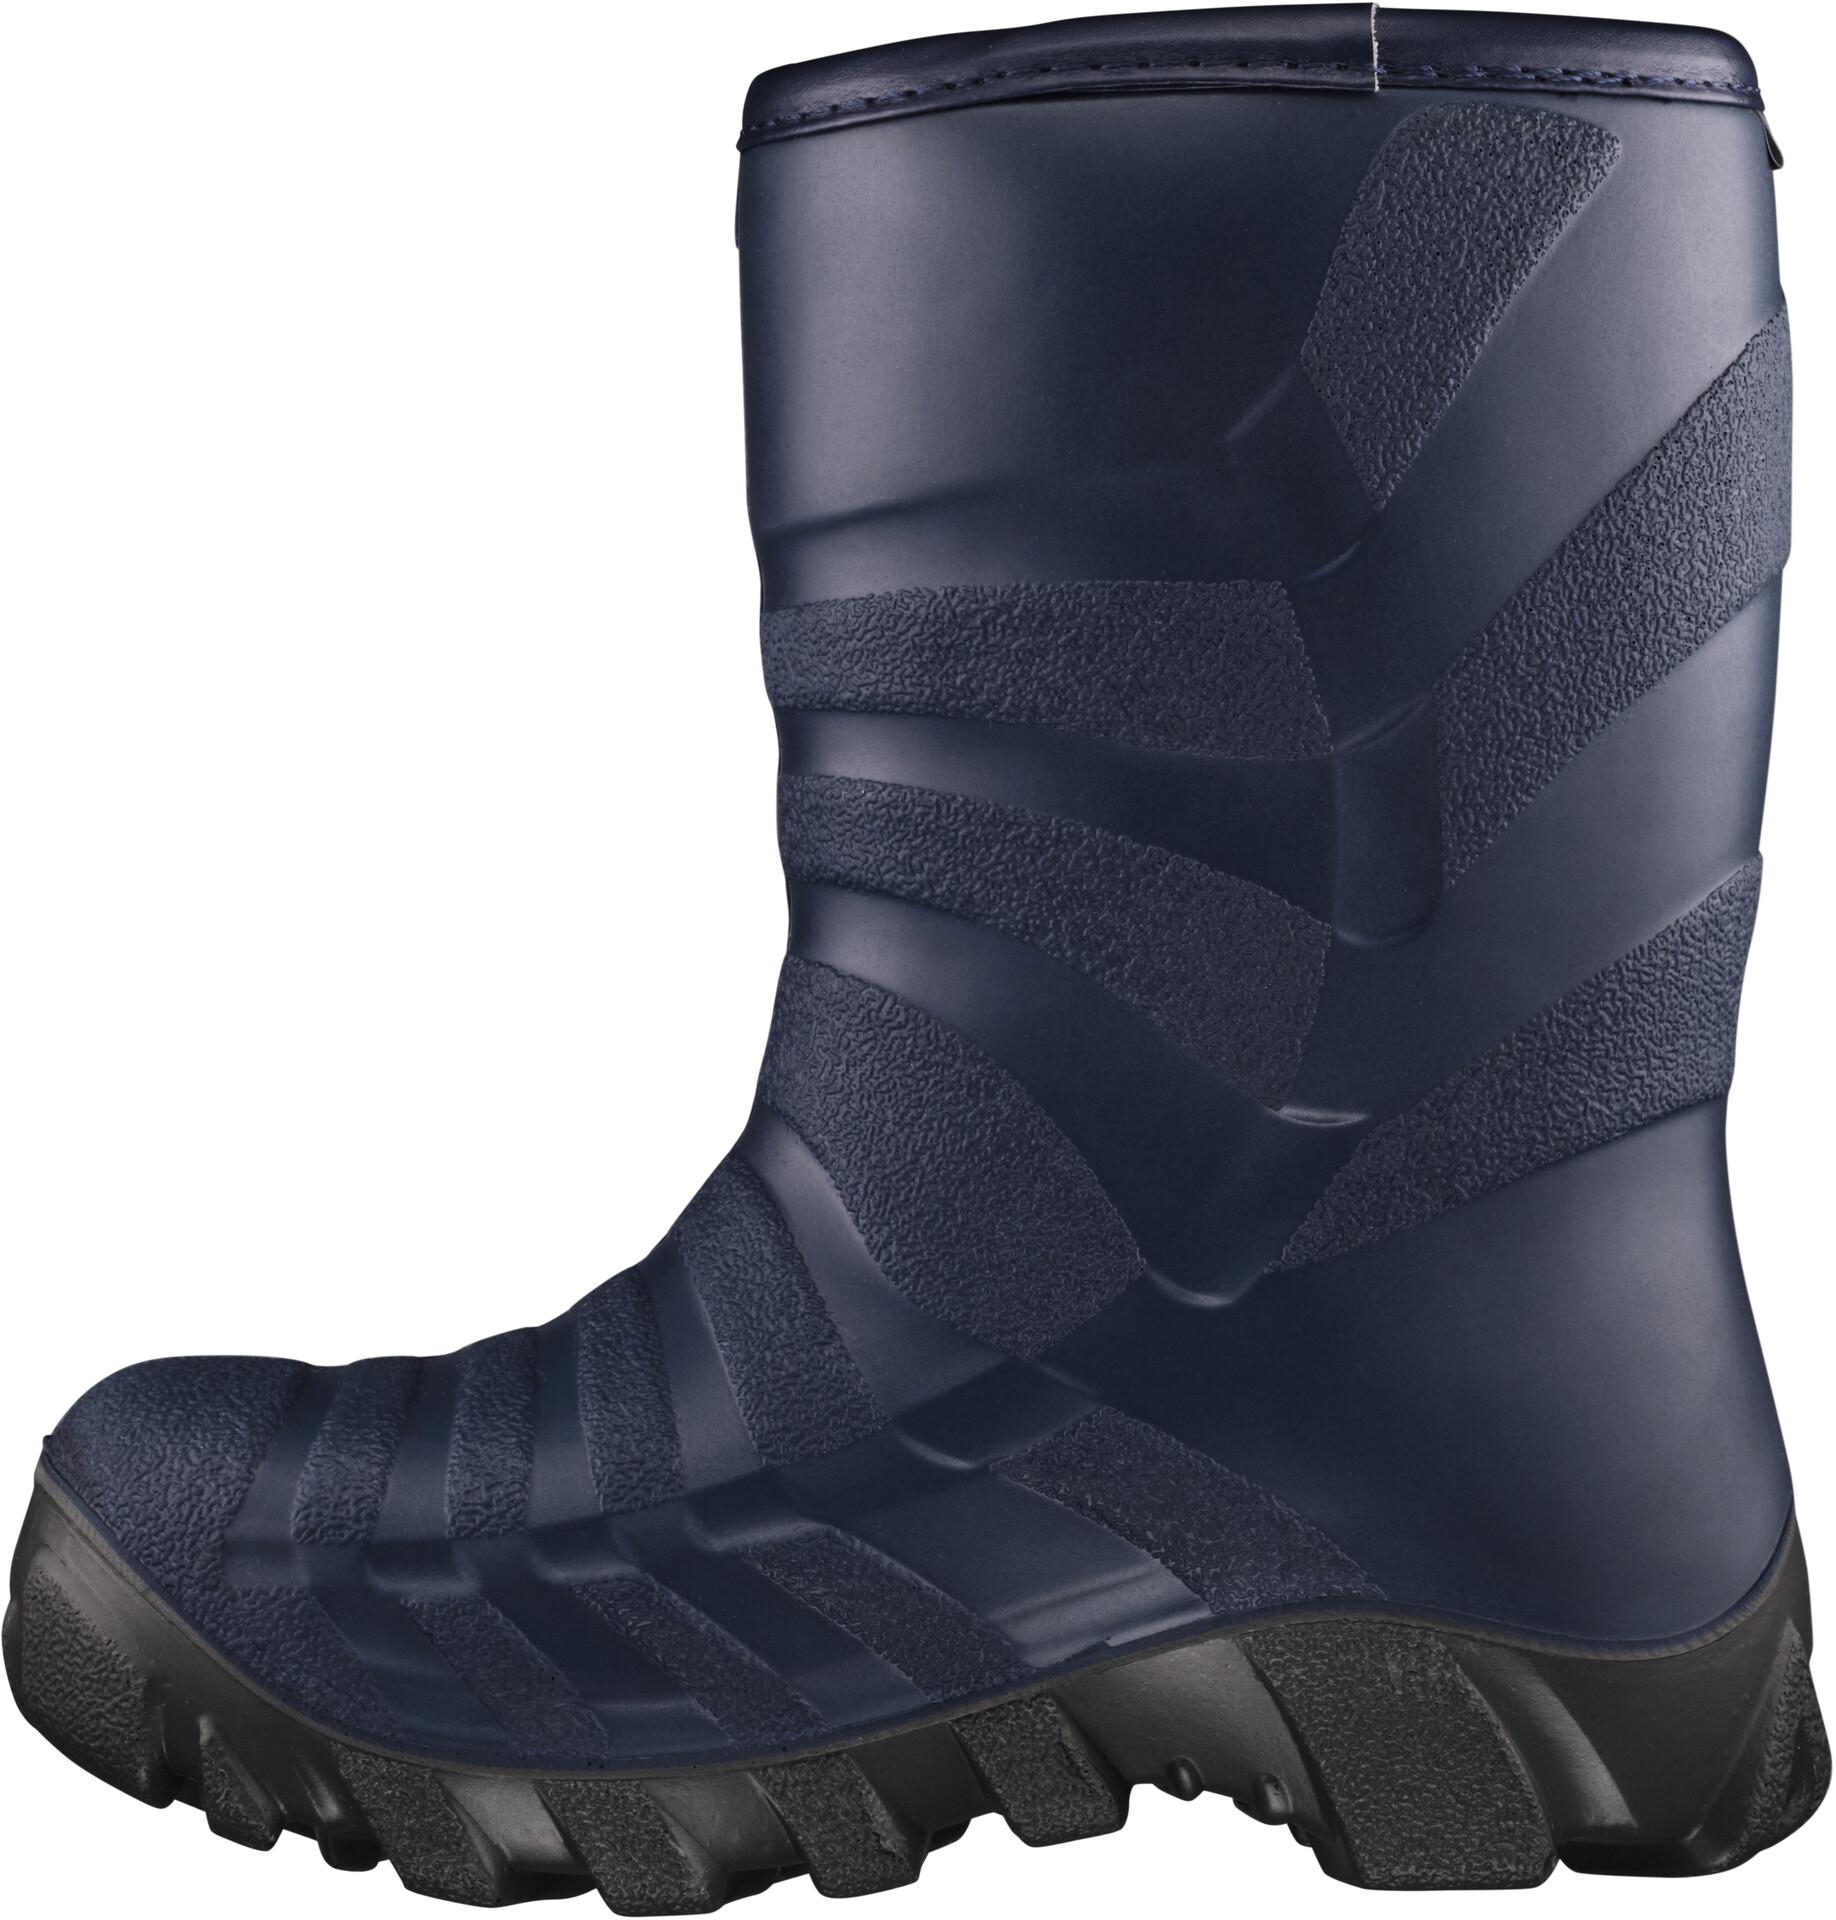 Viking Footwear Ultra 2.0 Boots Kids navycharcoal at